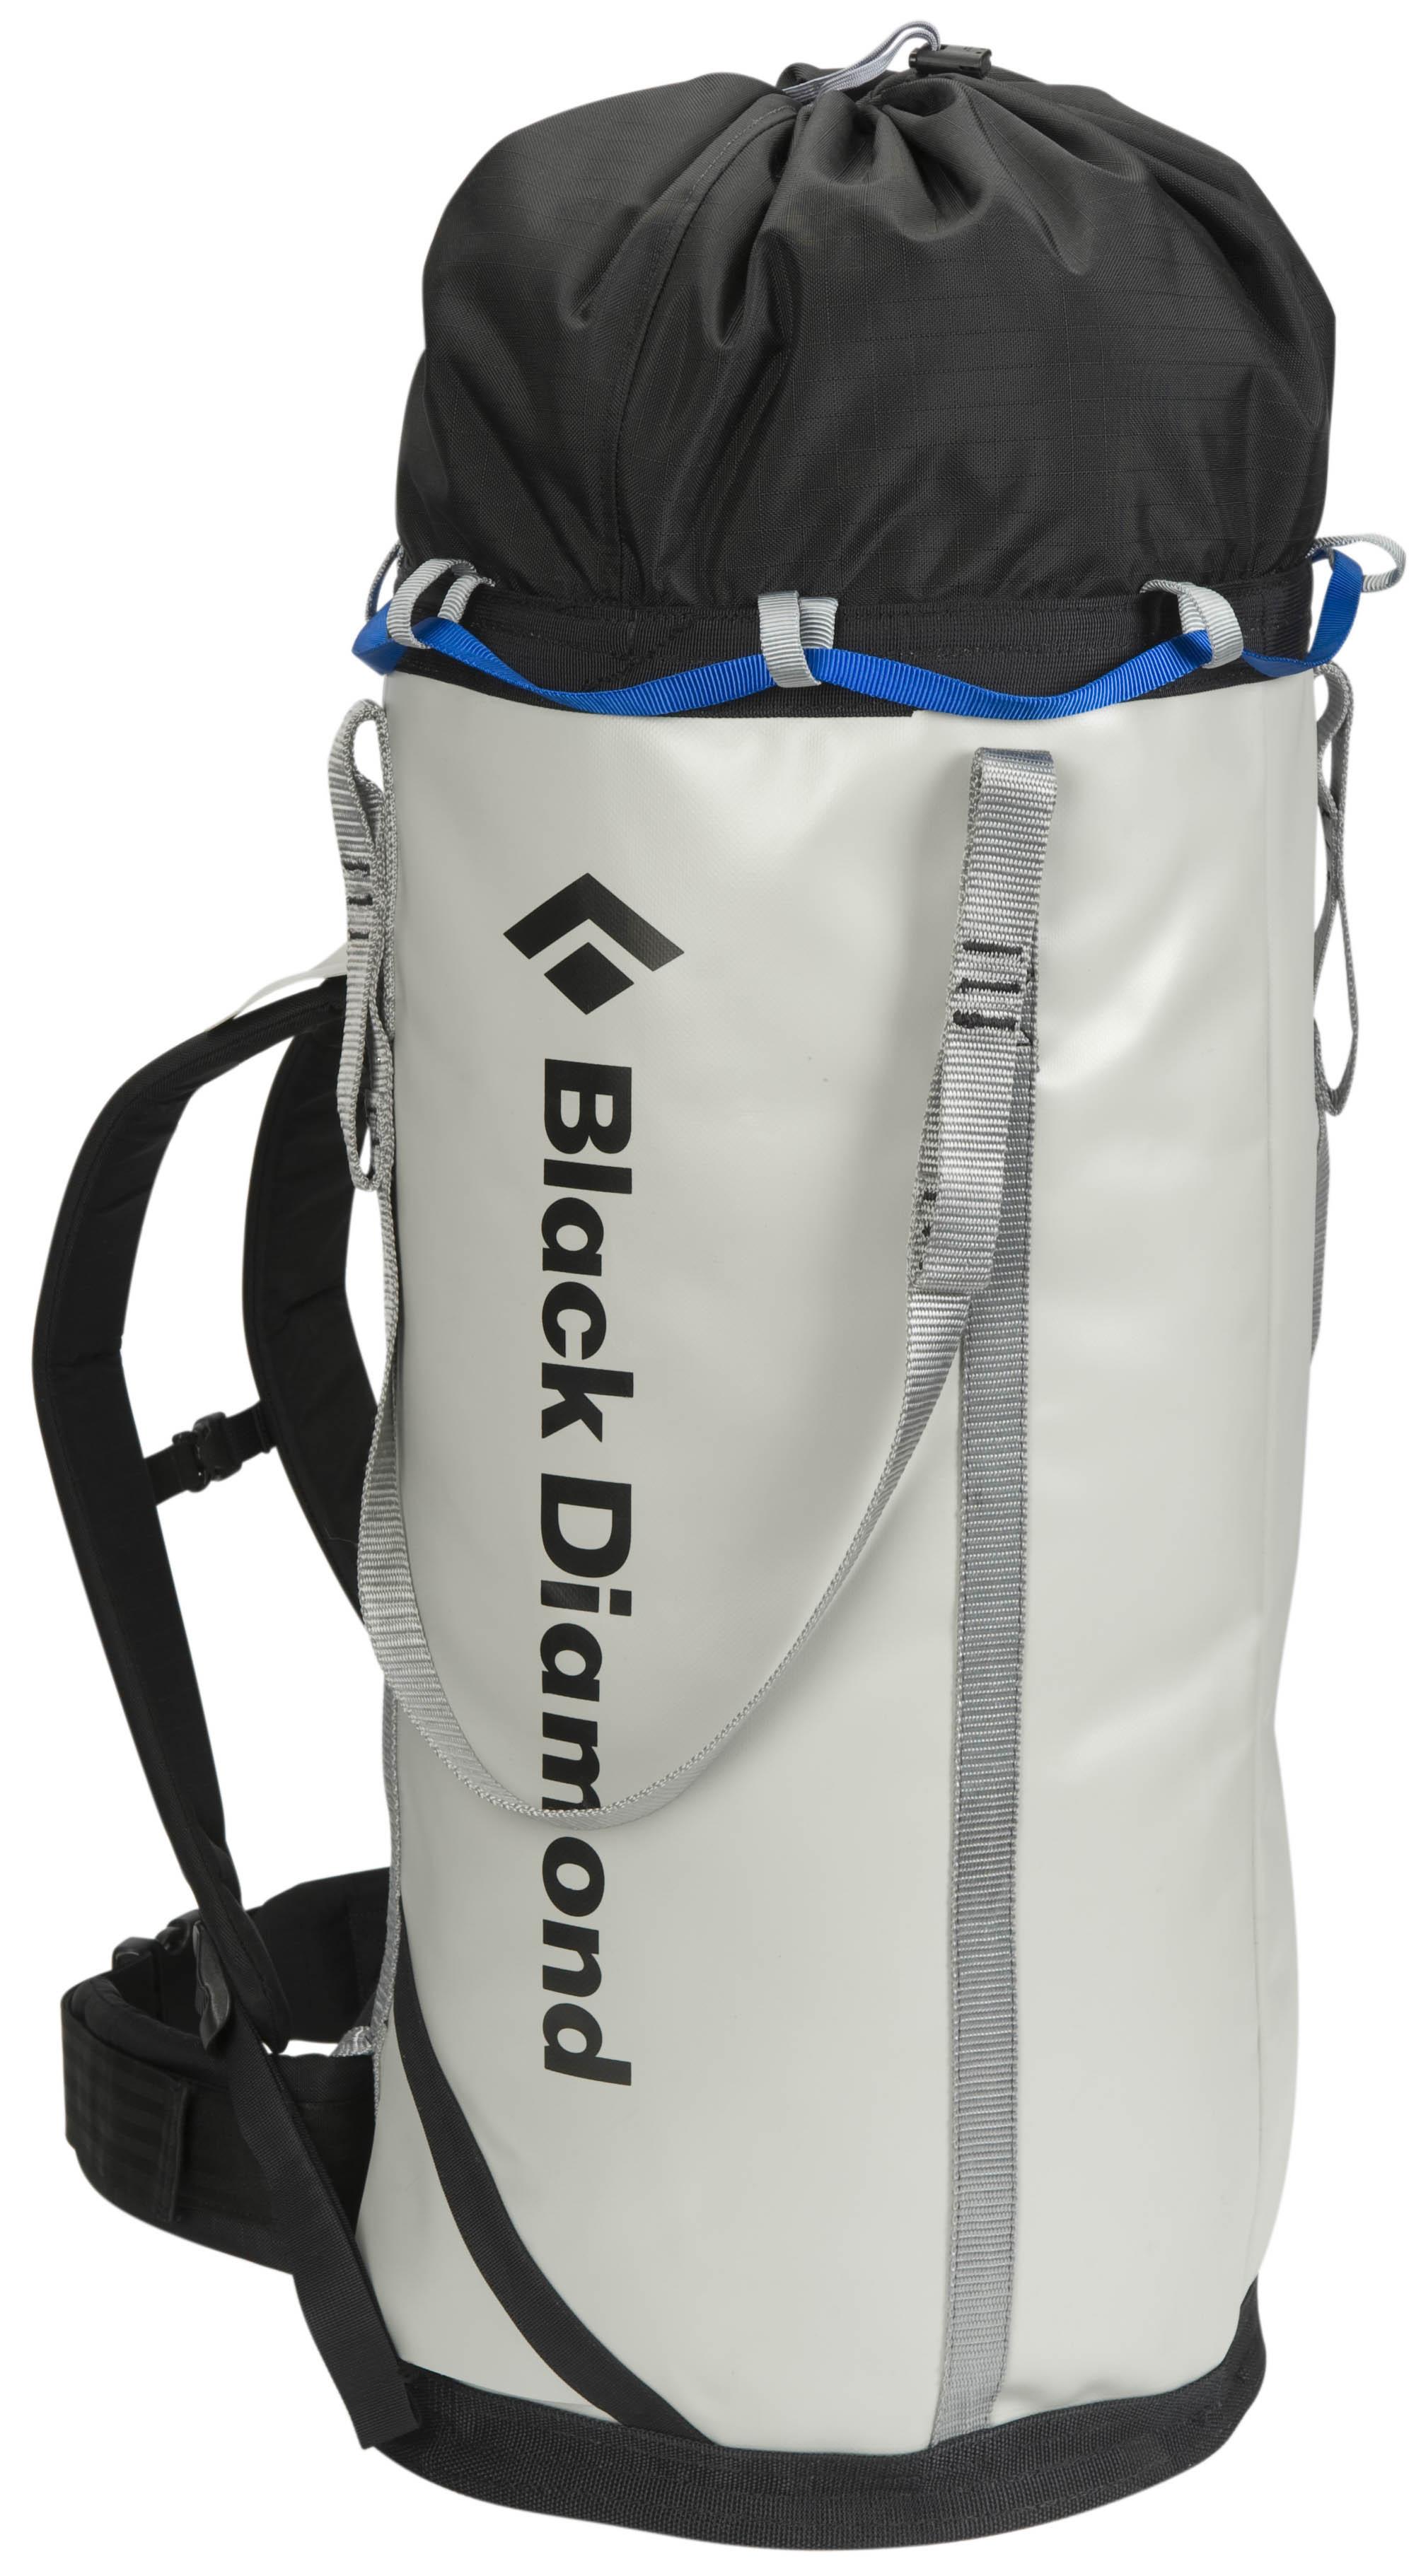 Black Diamond Touchstone 70 Haul Bag